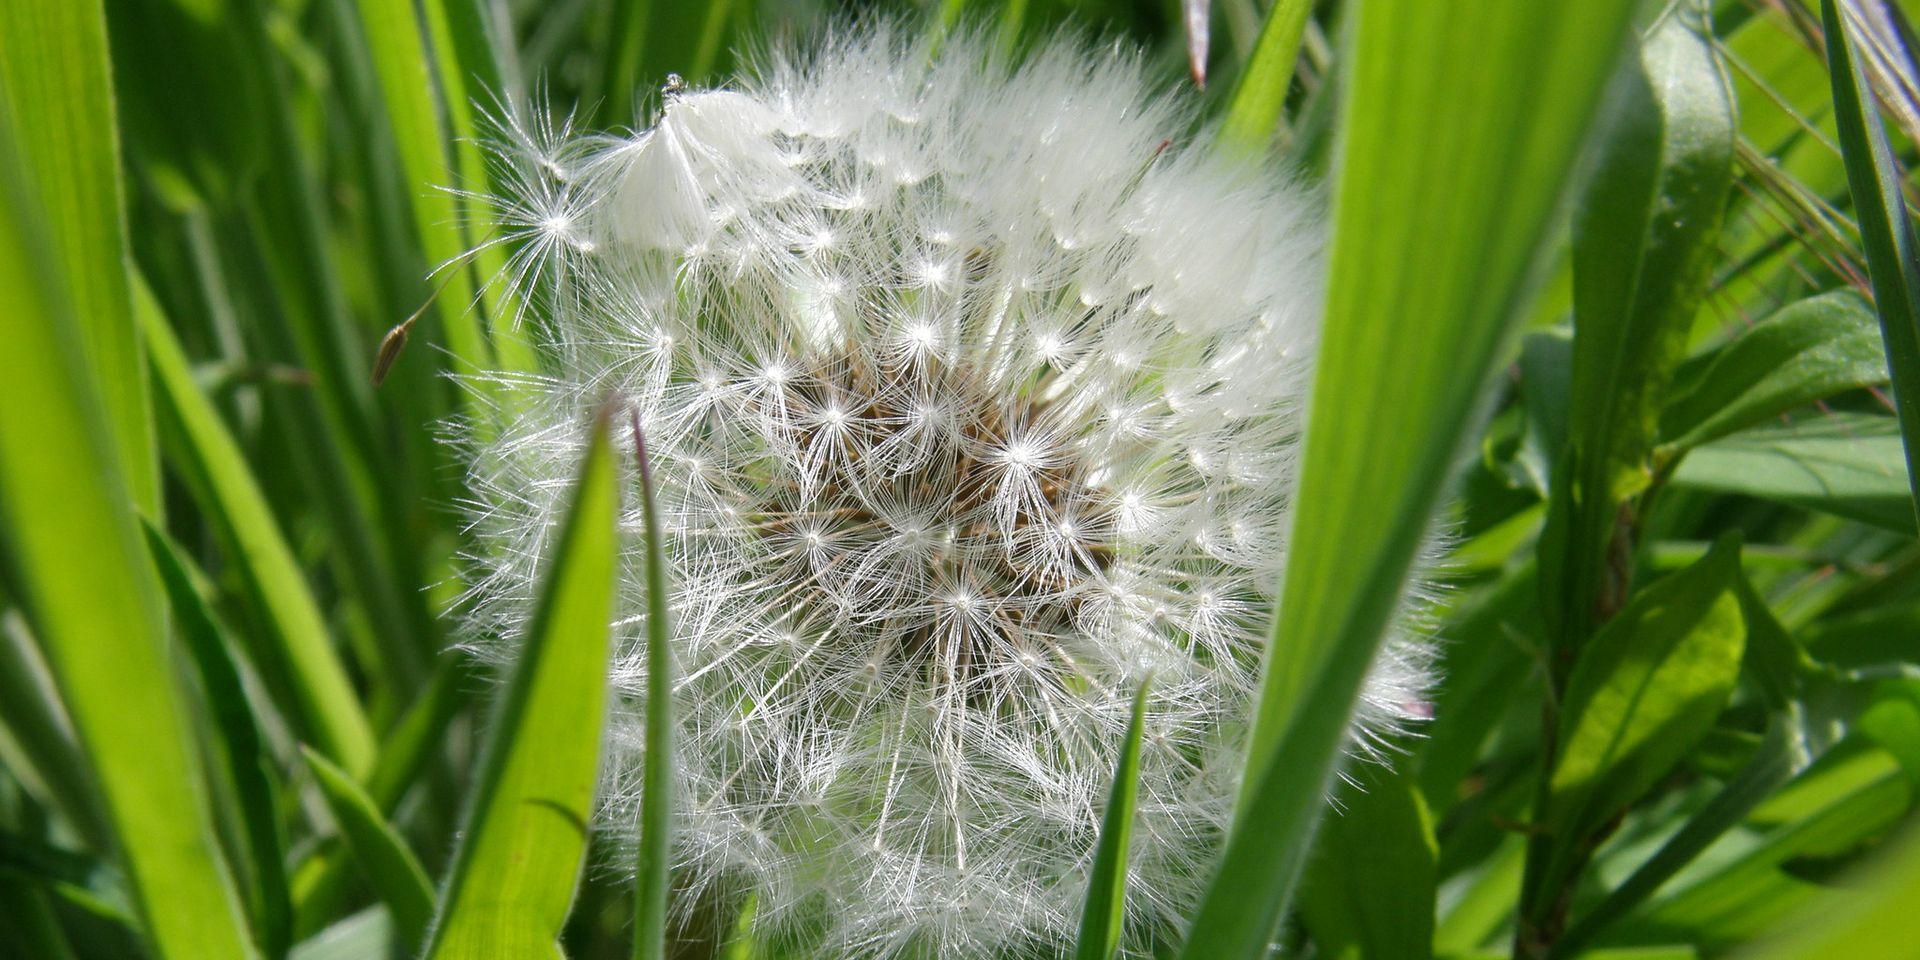 Dandelion - foto di Carol Munro (CC BY NC 2.0)